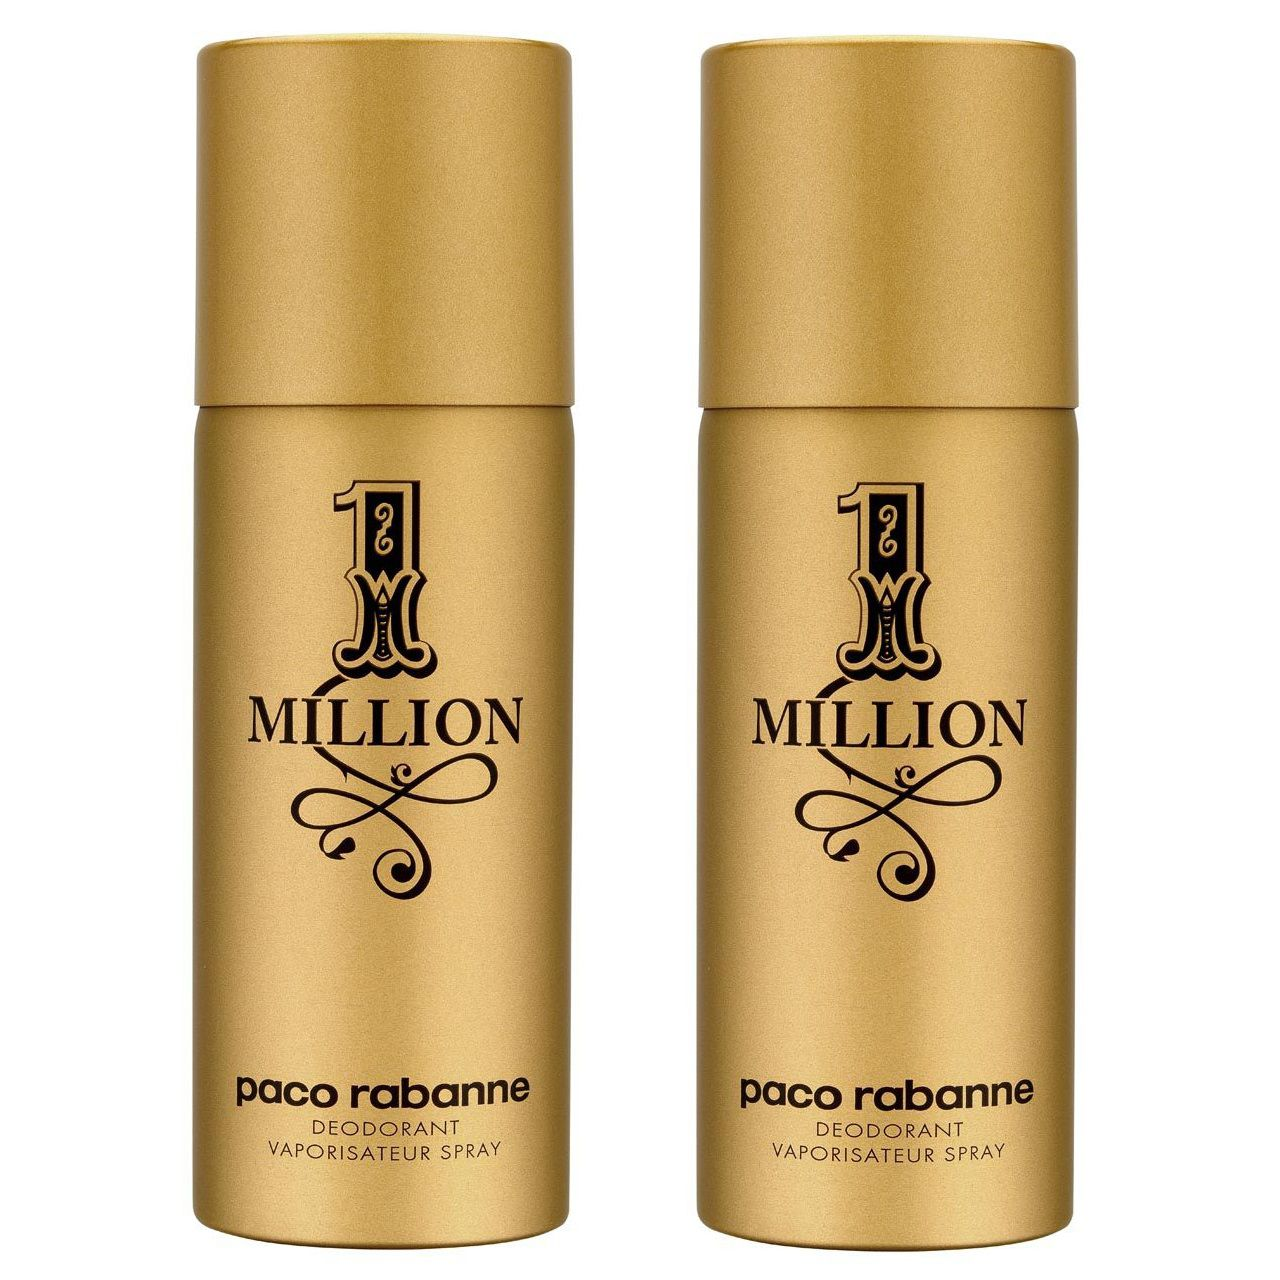 Paco Rabanne - 2x 1 Million Deodorant Spray 150 ml